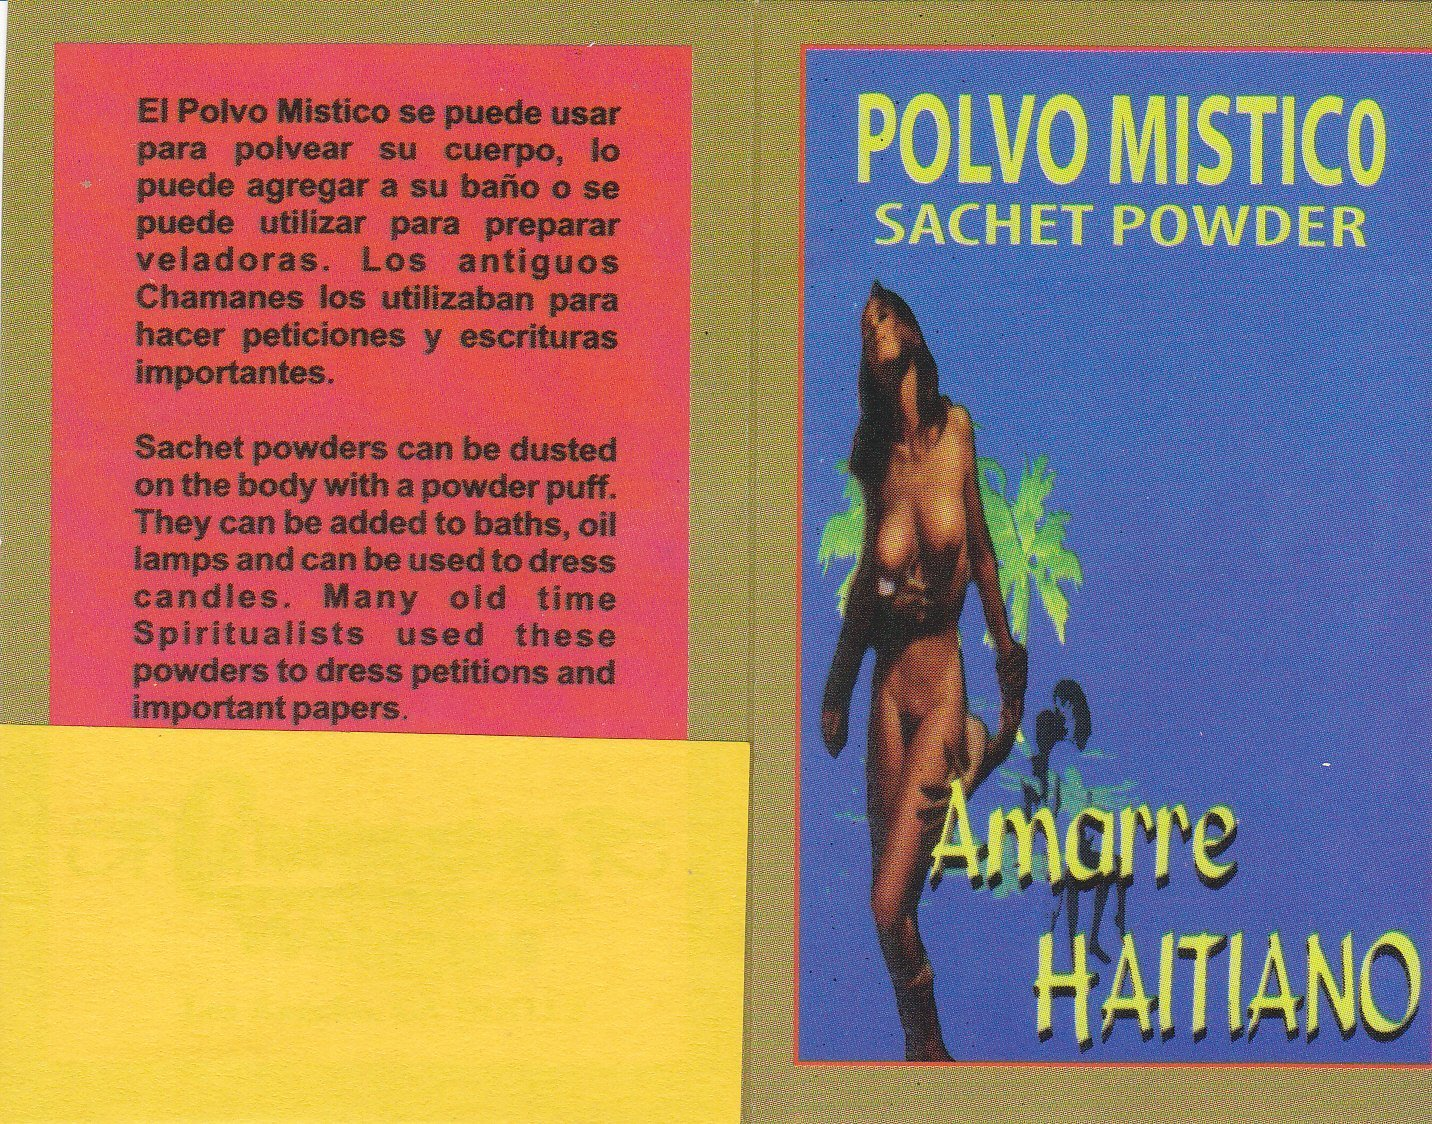 1 pkt. POLVO MISTICO AMARRE HAITIANO SACHET POWDER 1/2 oz pkt .... by Unknown (Image #4)